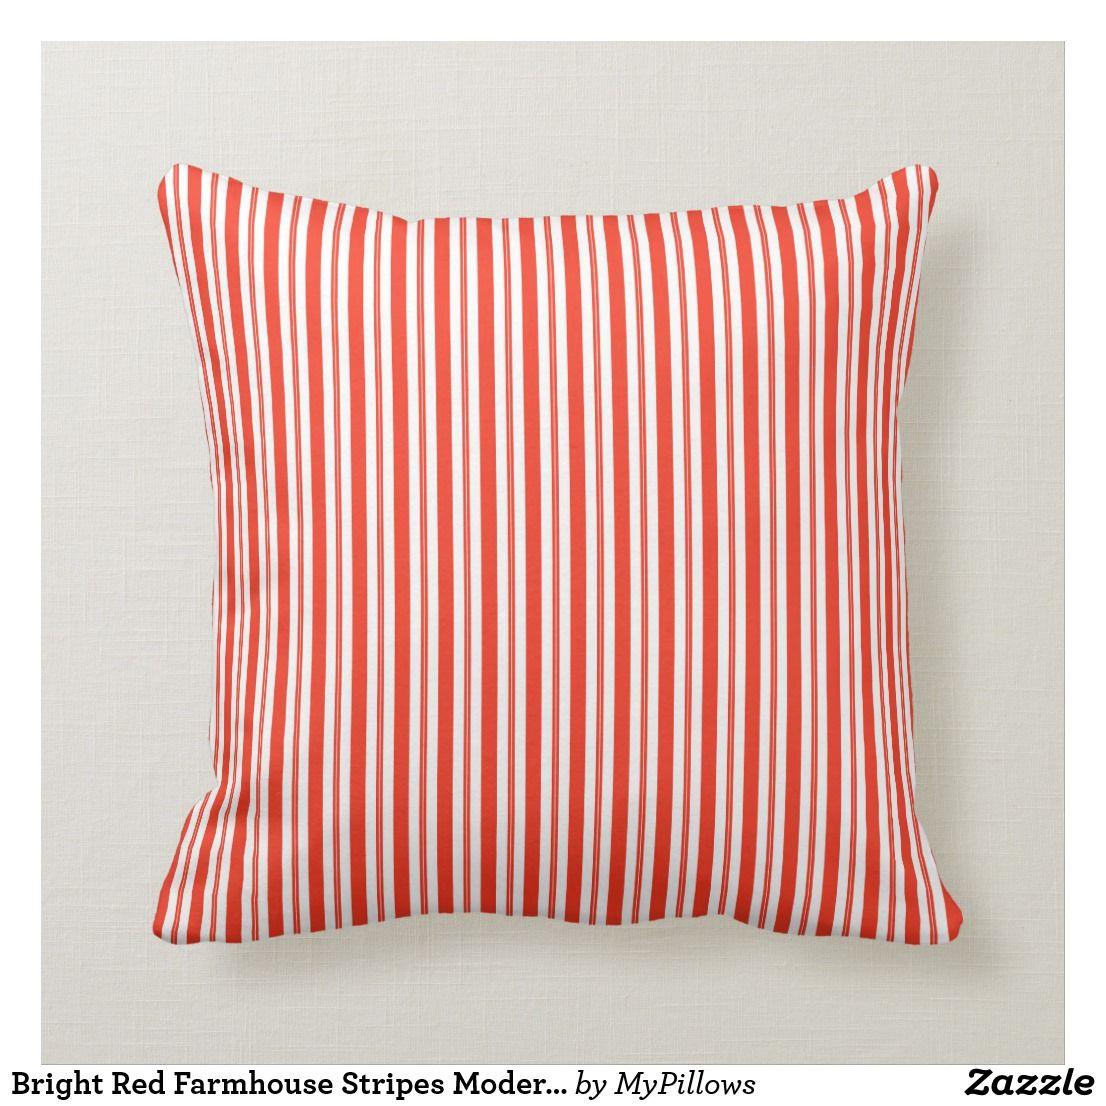 Bright red farmhouse stripes modern pattern 03 throw